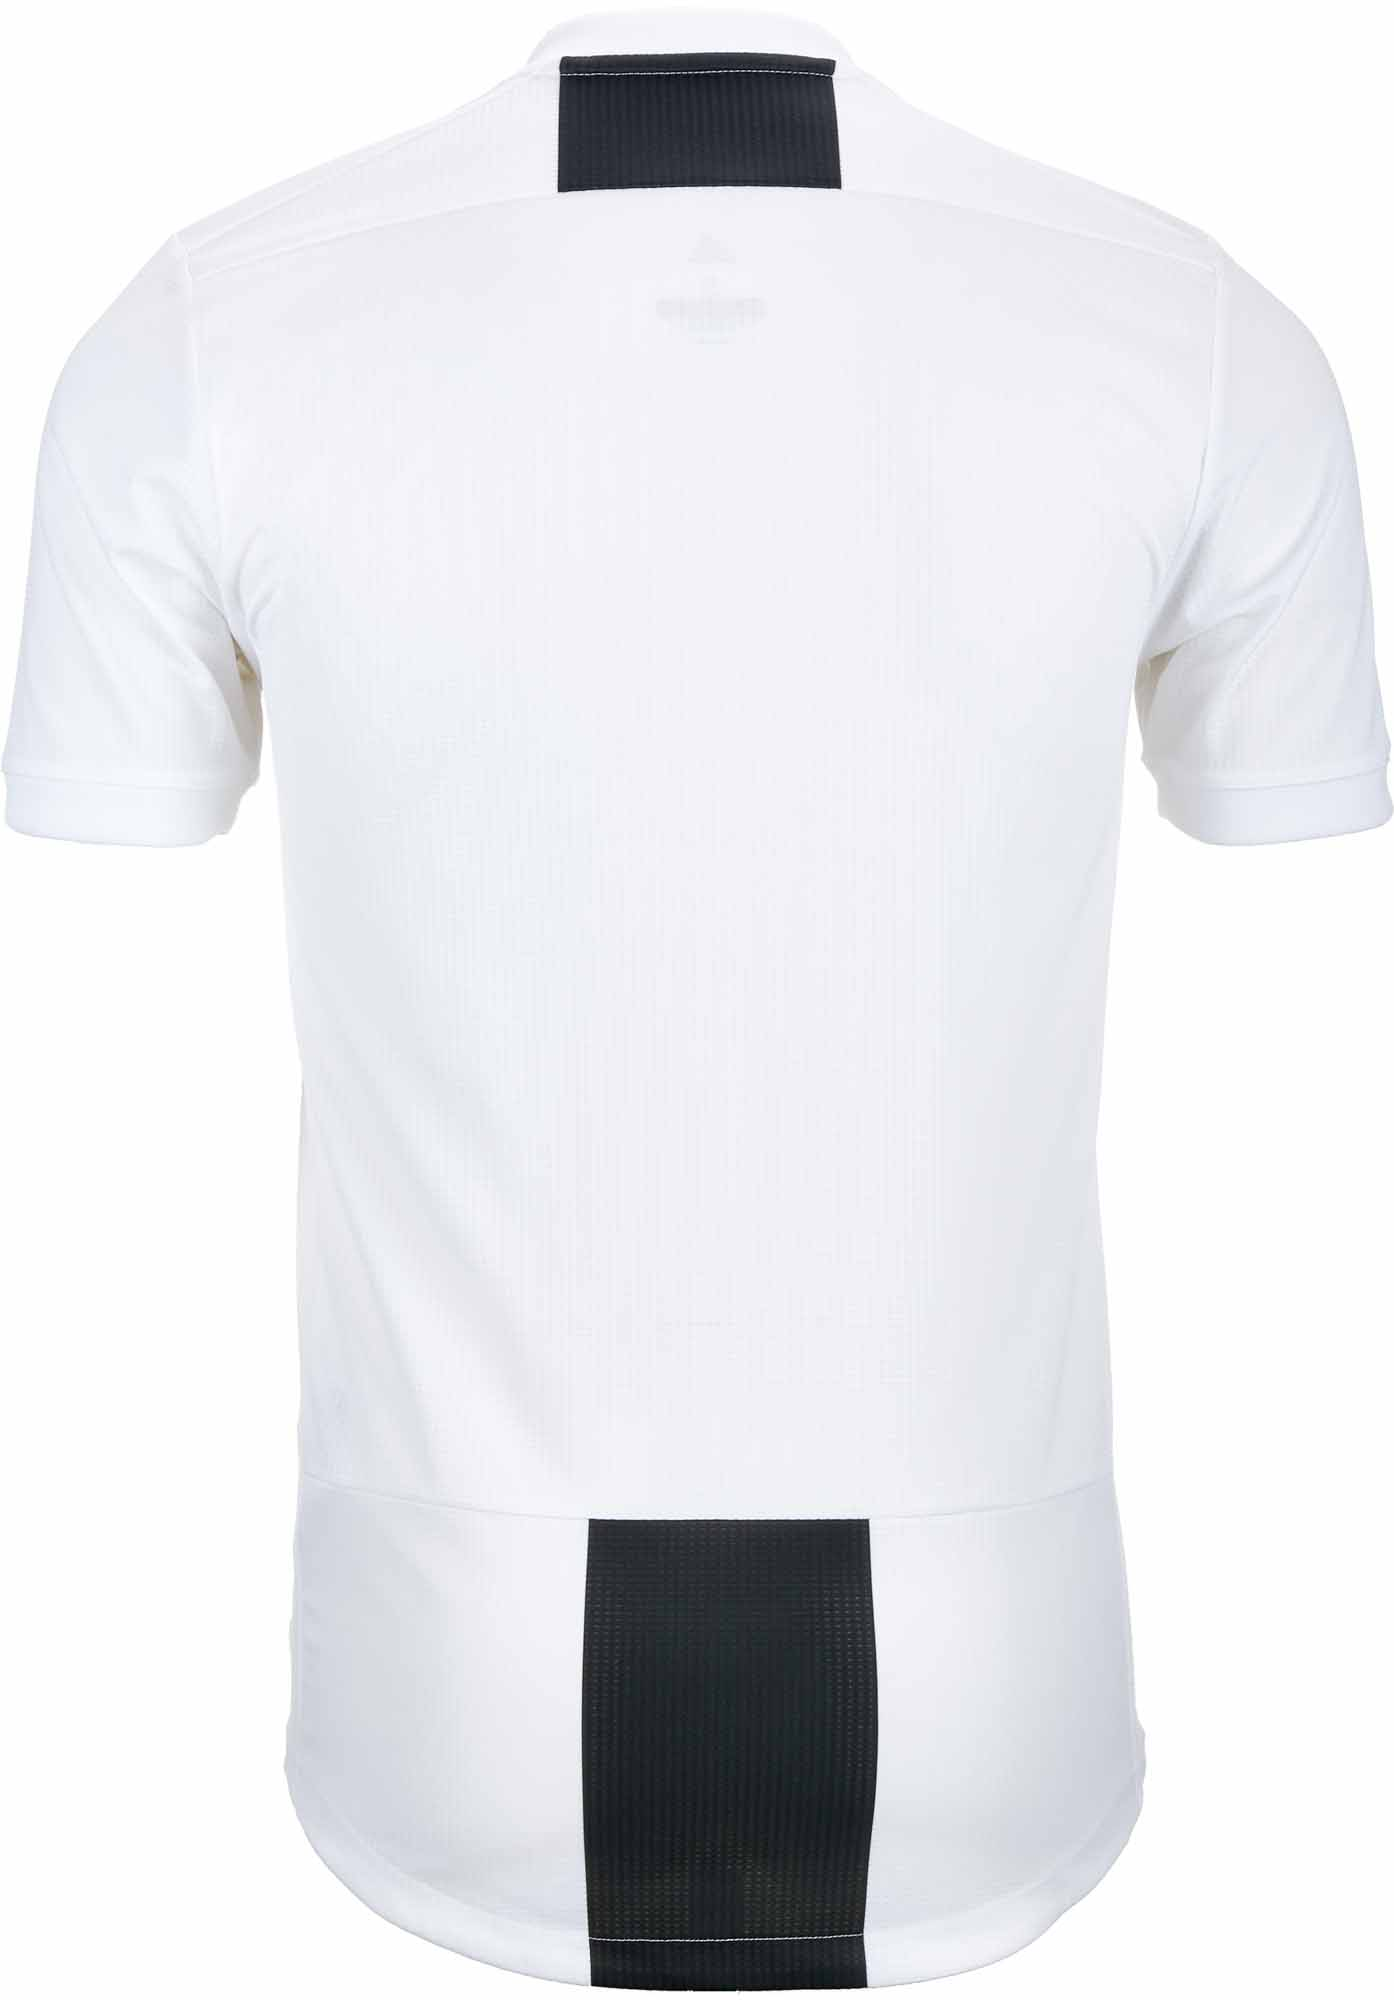 best website d9a06 f7dee adidas Juventus Home Authentic Jersey 2018-19 - SoccerPro